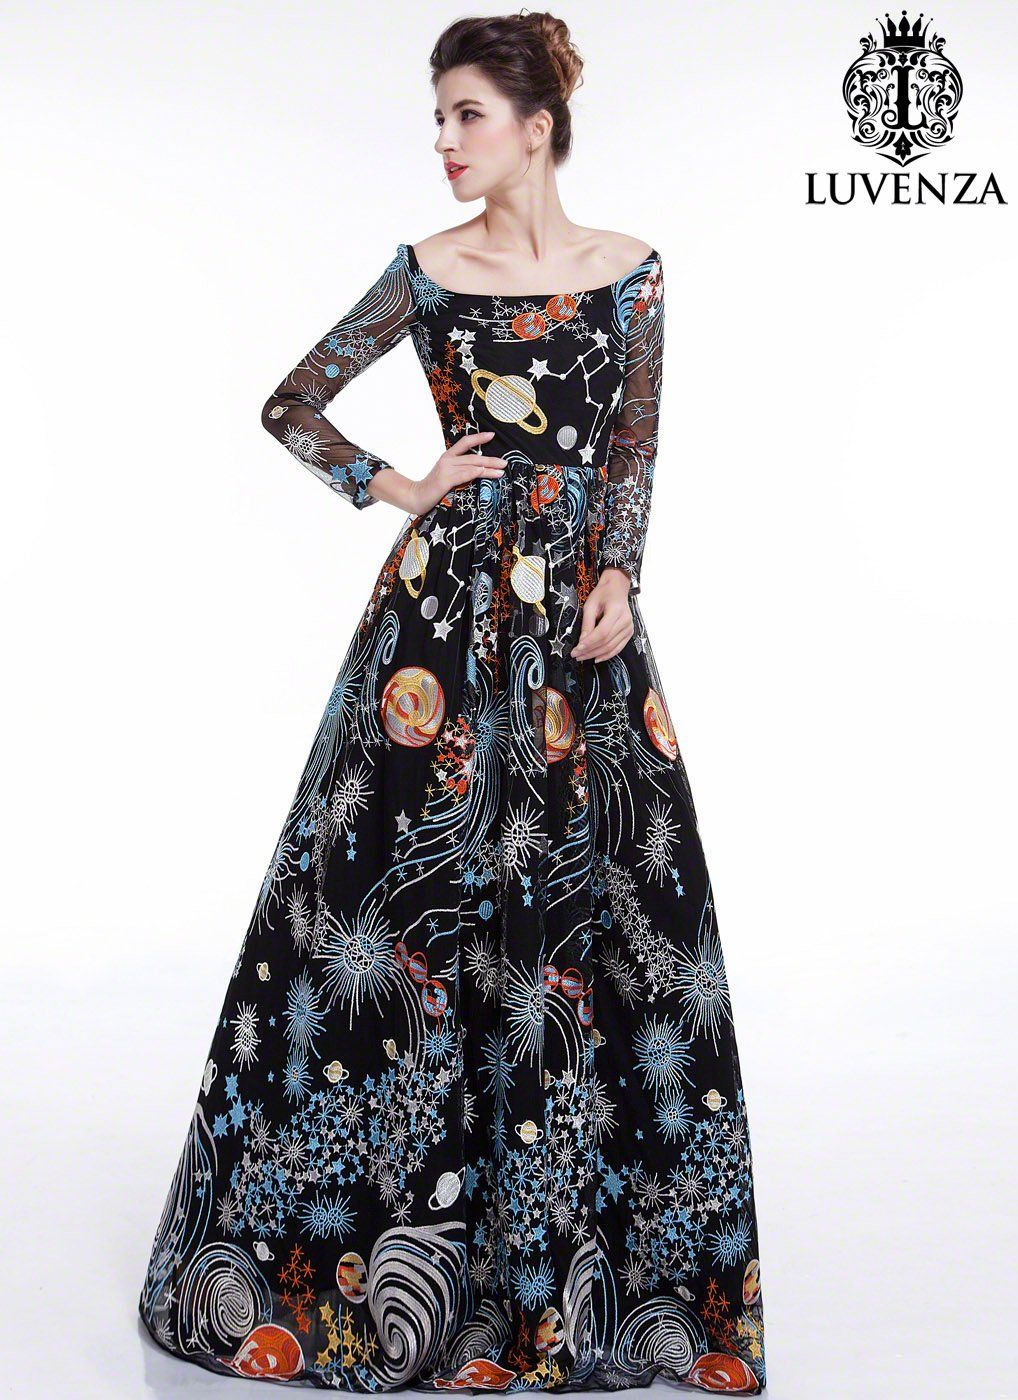 Black galaxy print floor length evening dress with